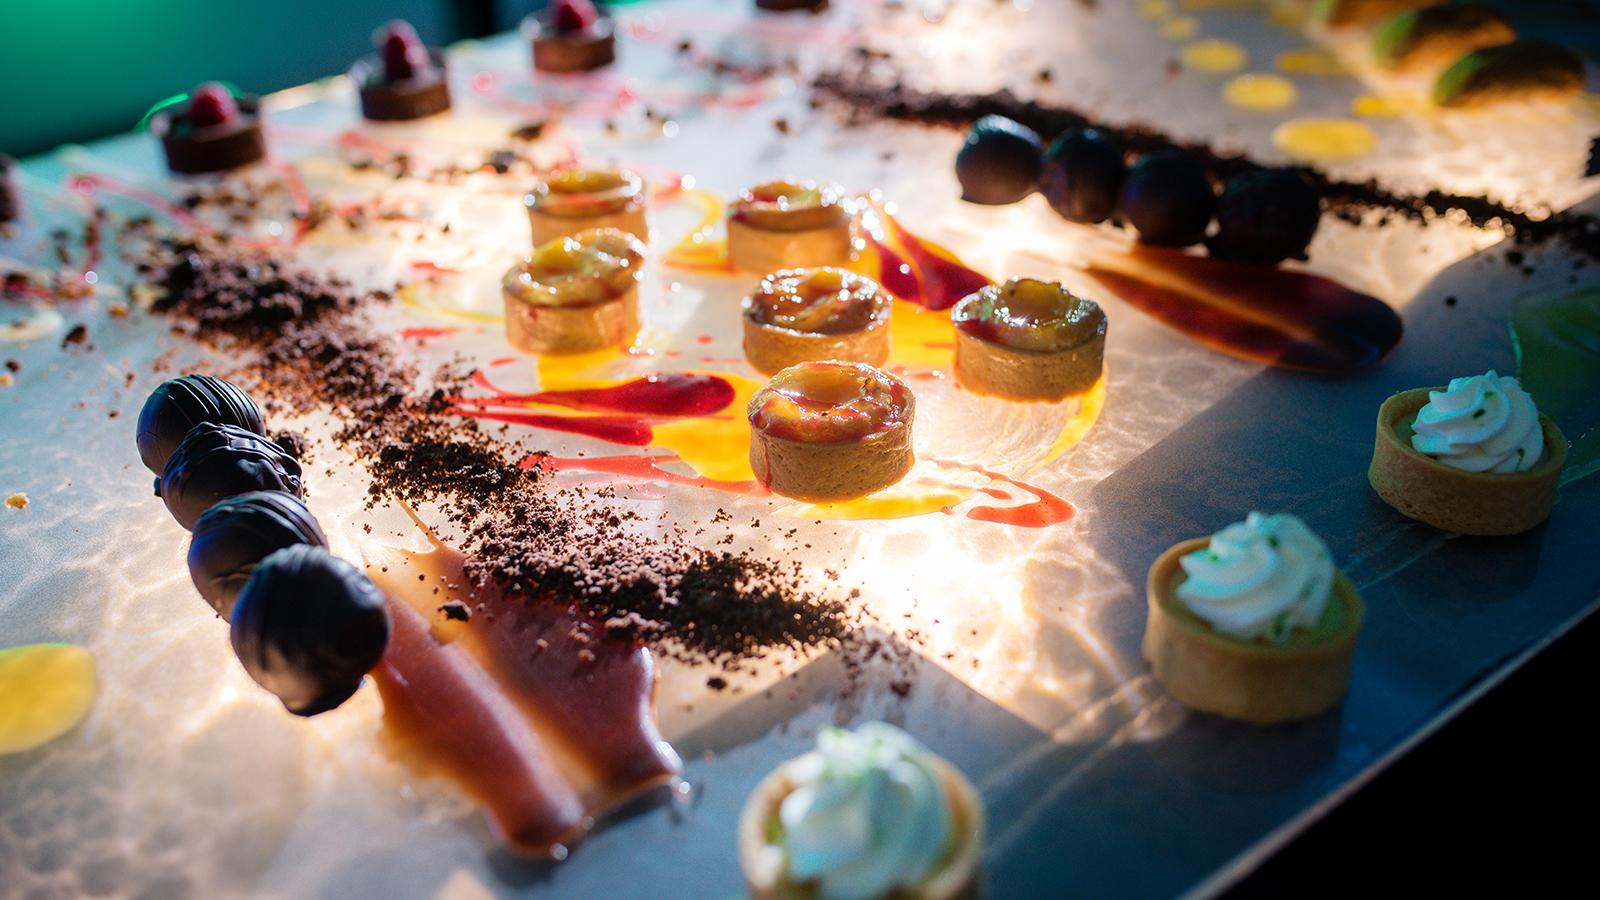 Dessert Display At Event